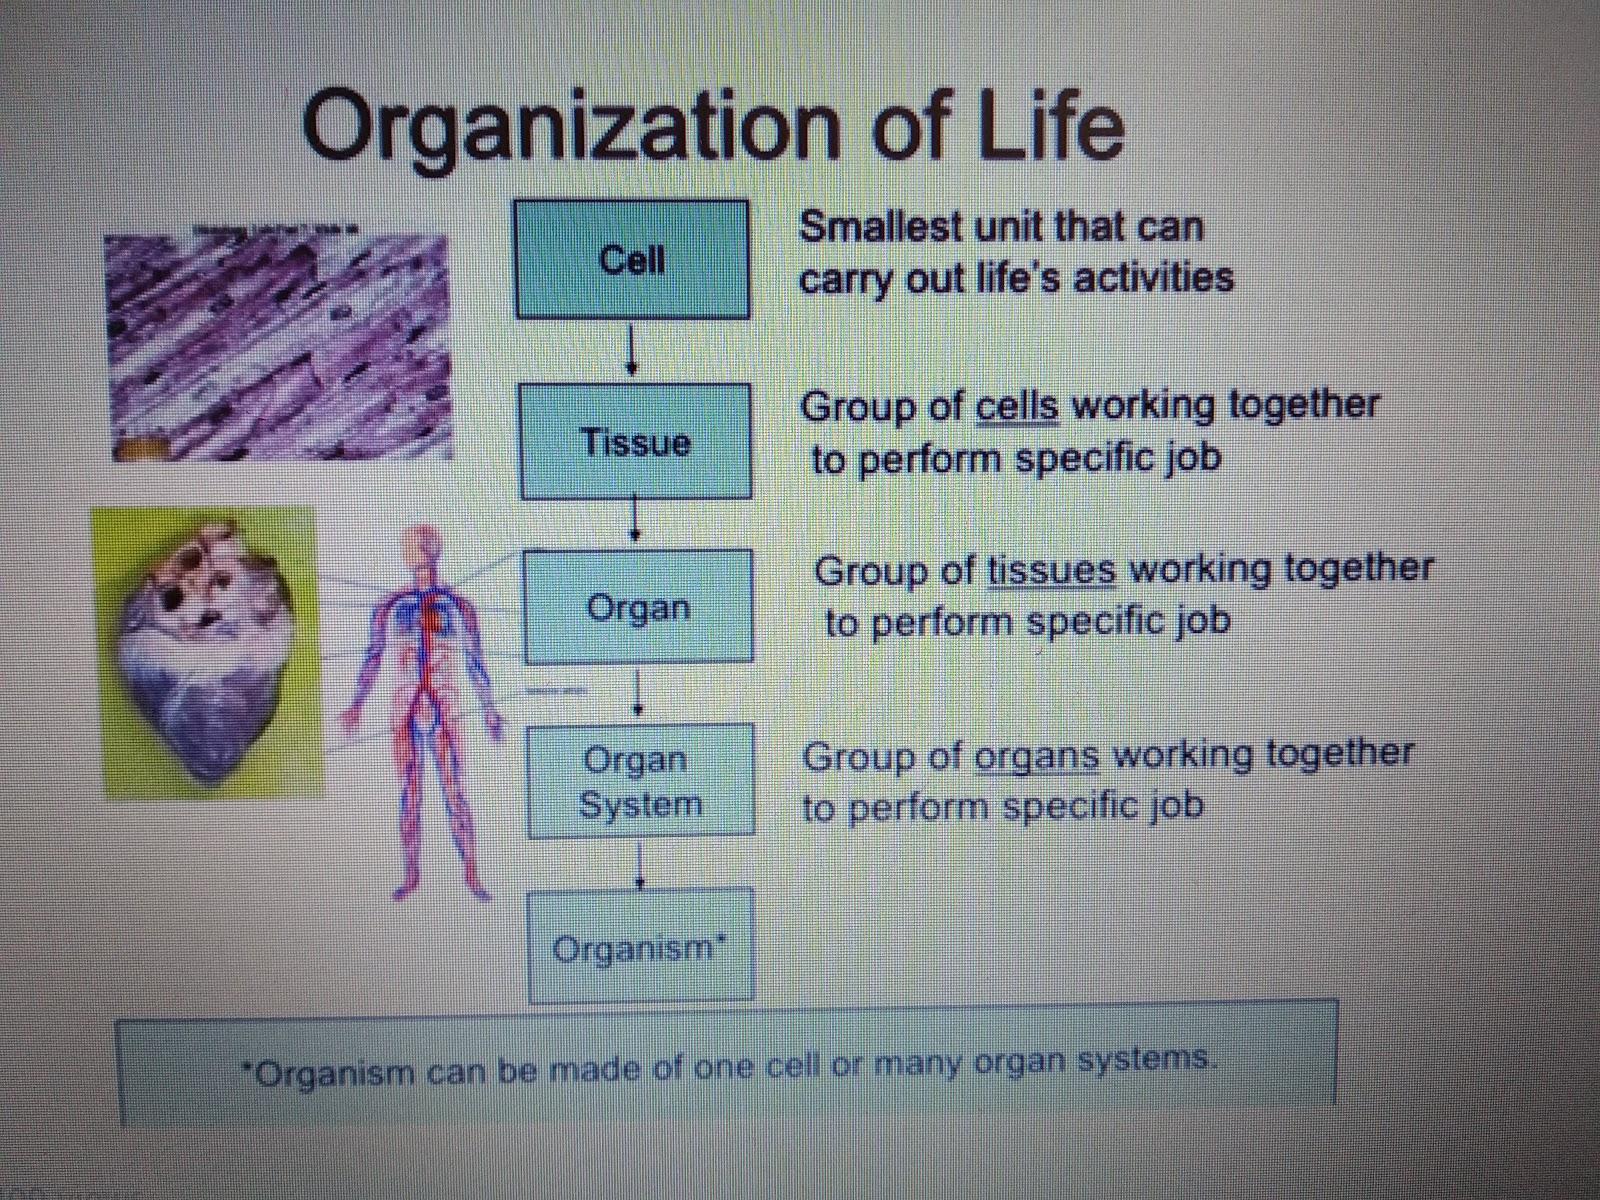 Natural Science Cell Tissue Organ System Organism